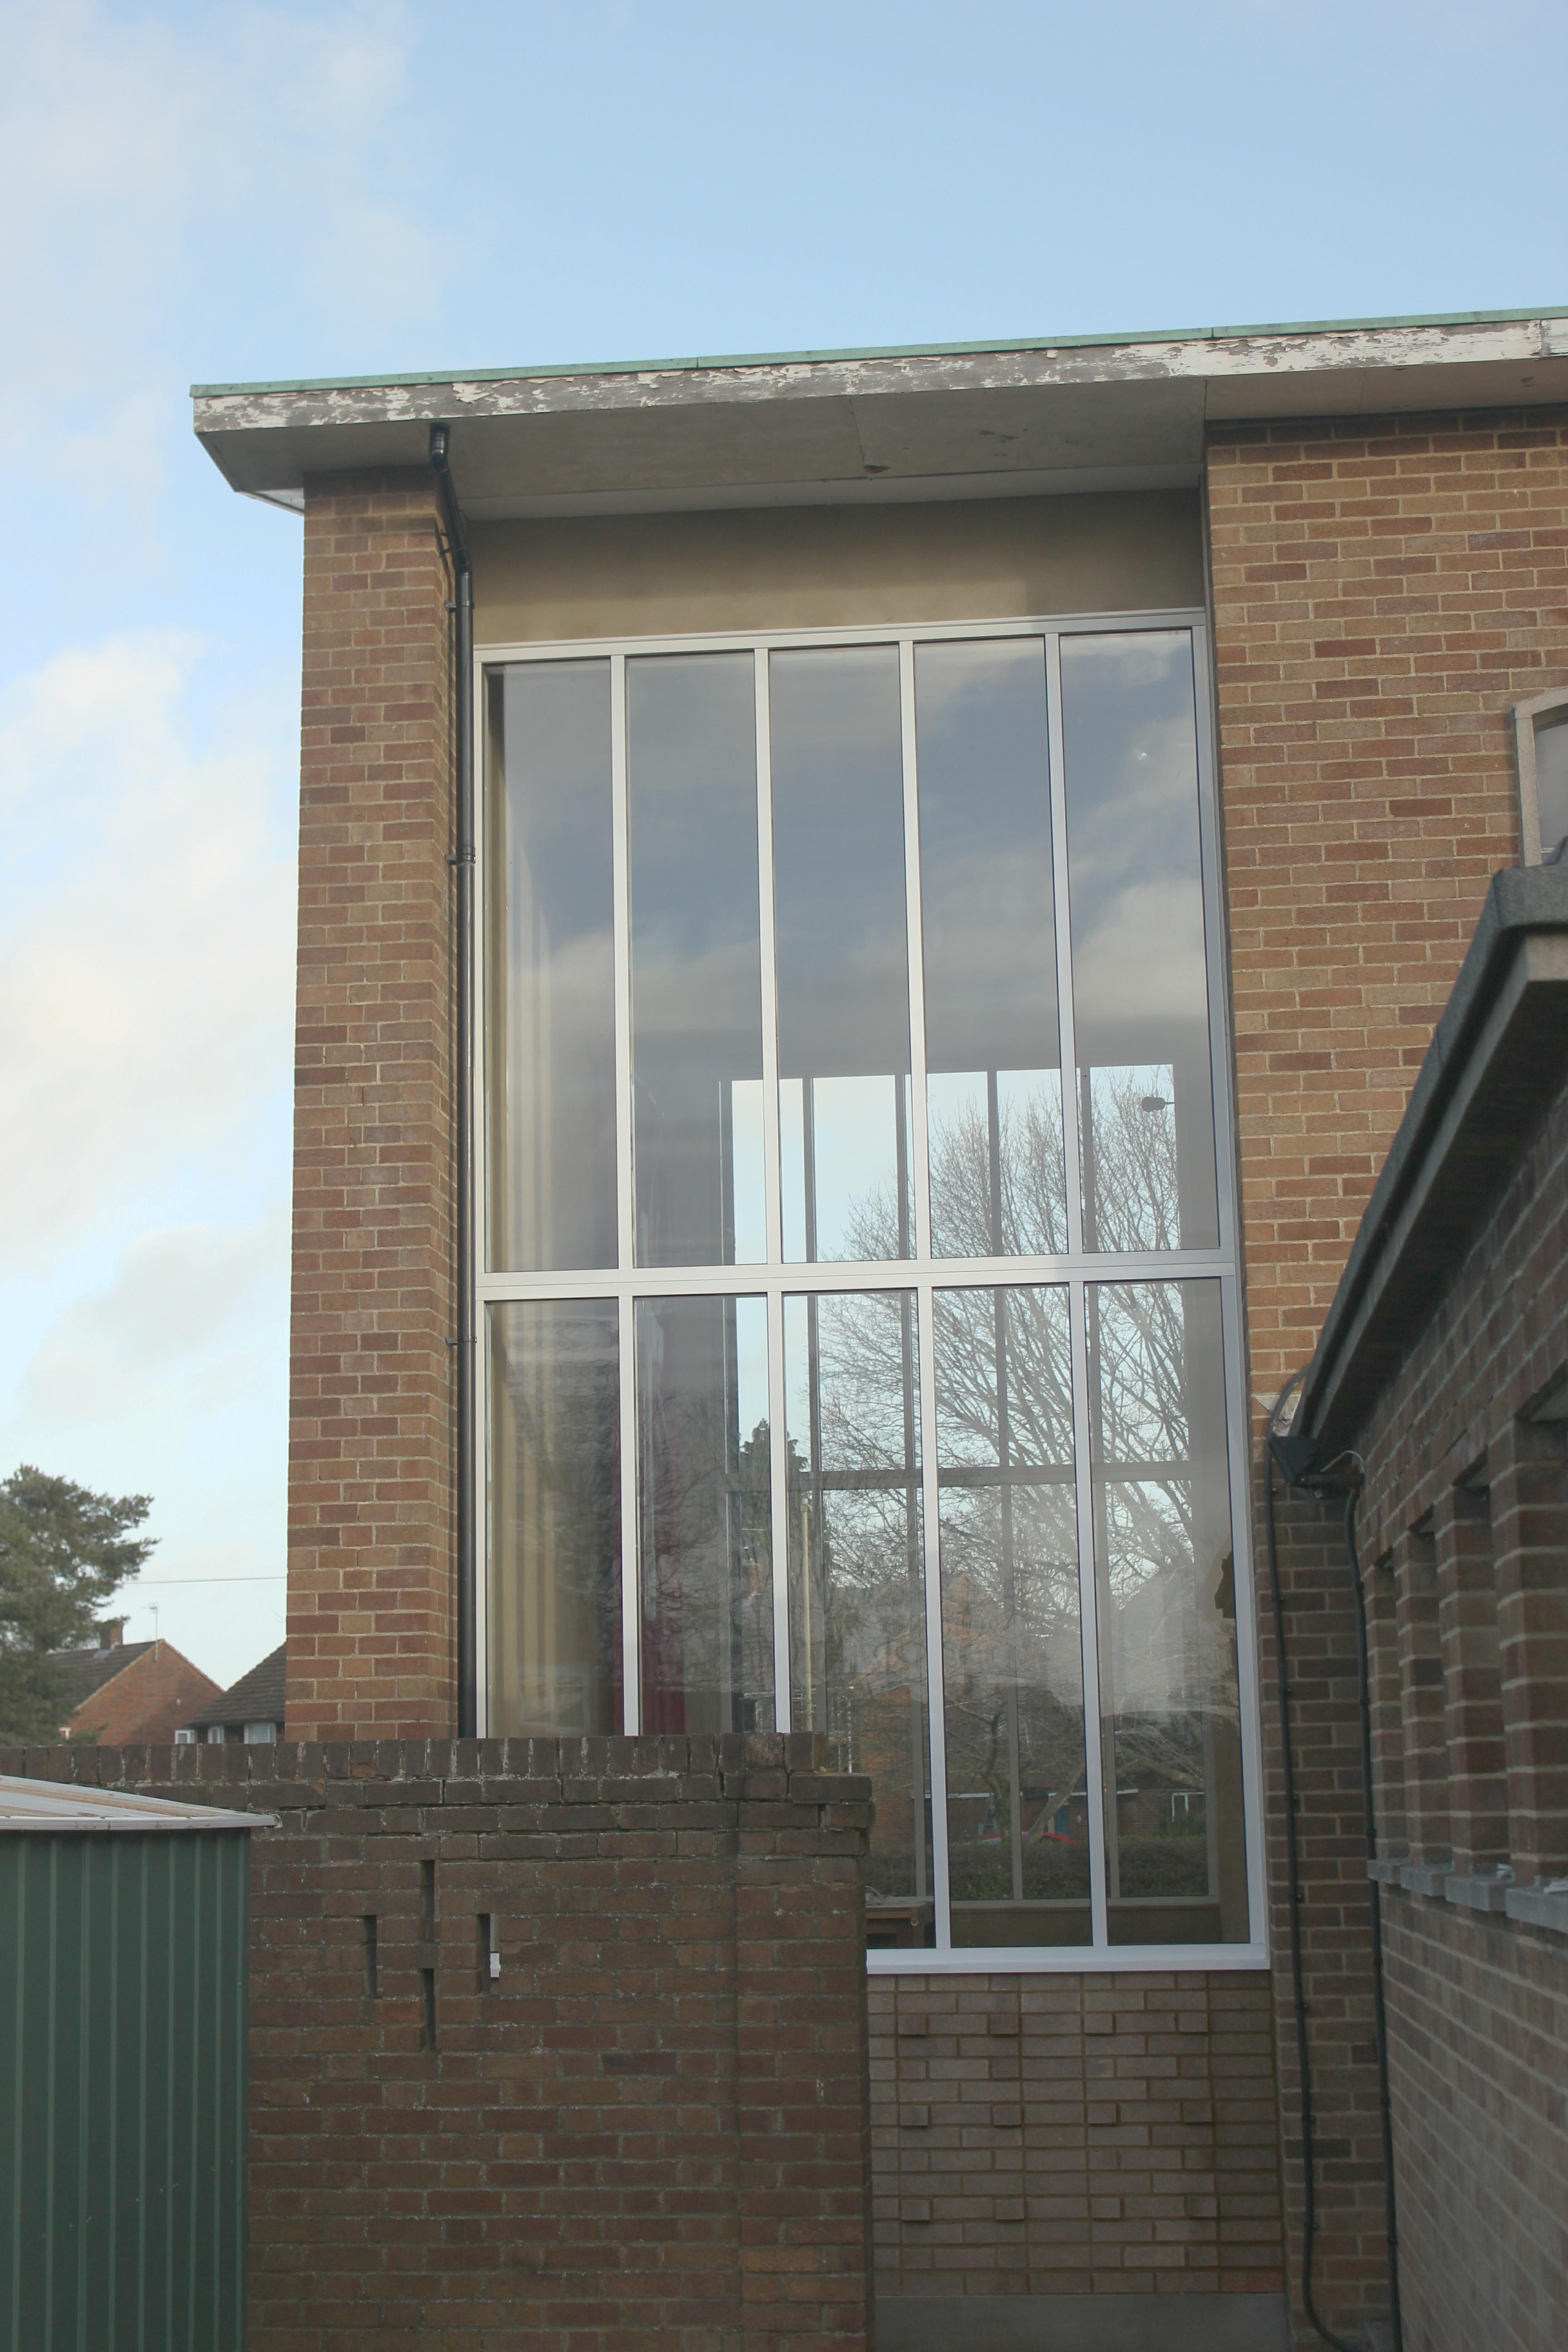 The South Sanctuary window